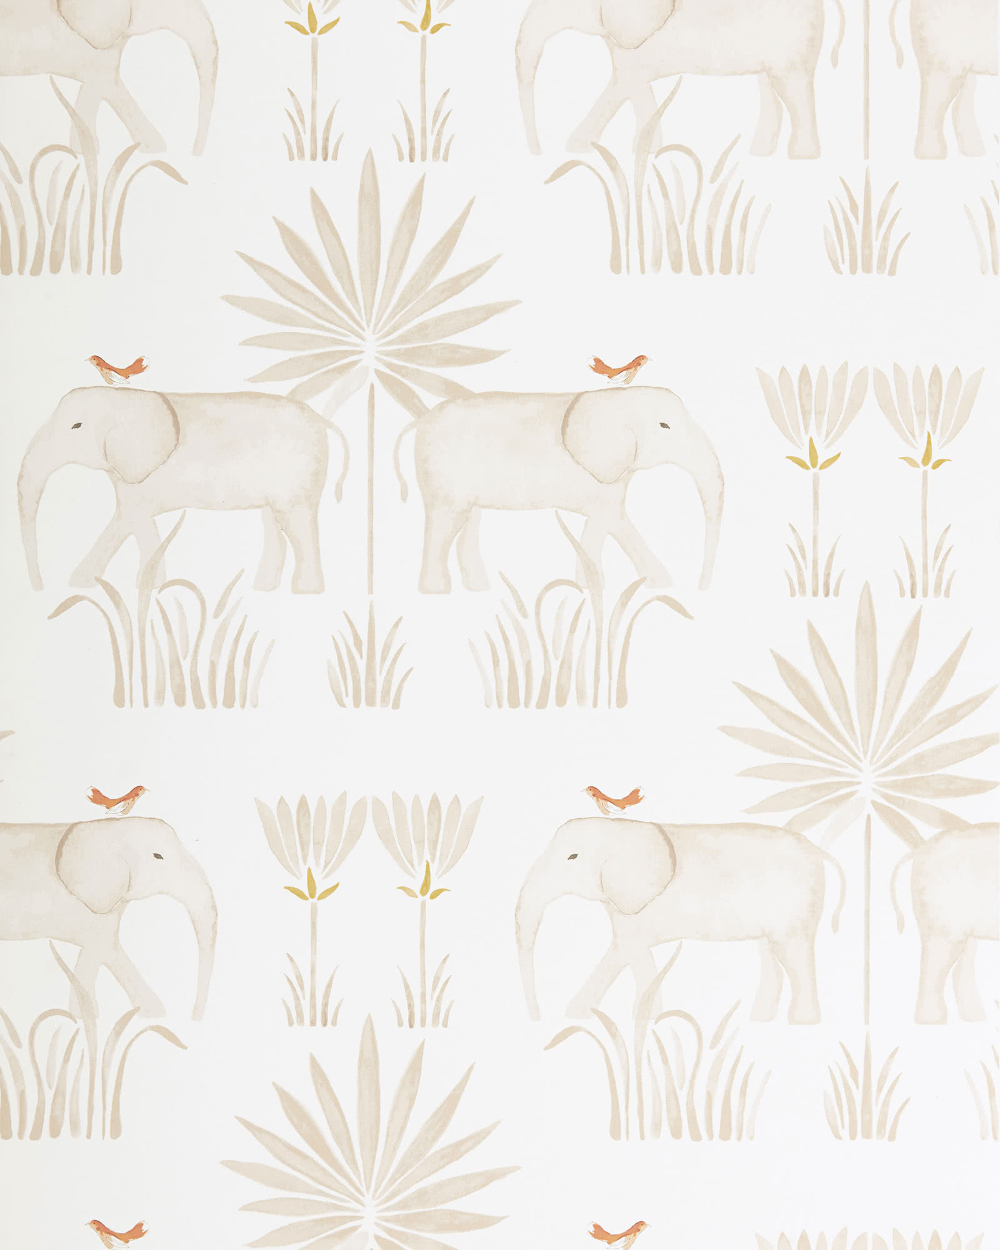 Kalahari Wallpaper In 2021 Serena And Lily Wallpaper Elephant Wallpaper Lily Wallpaper